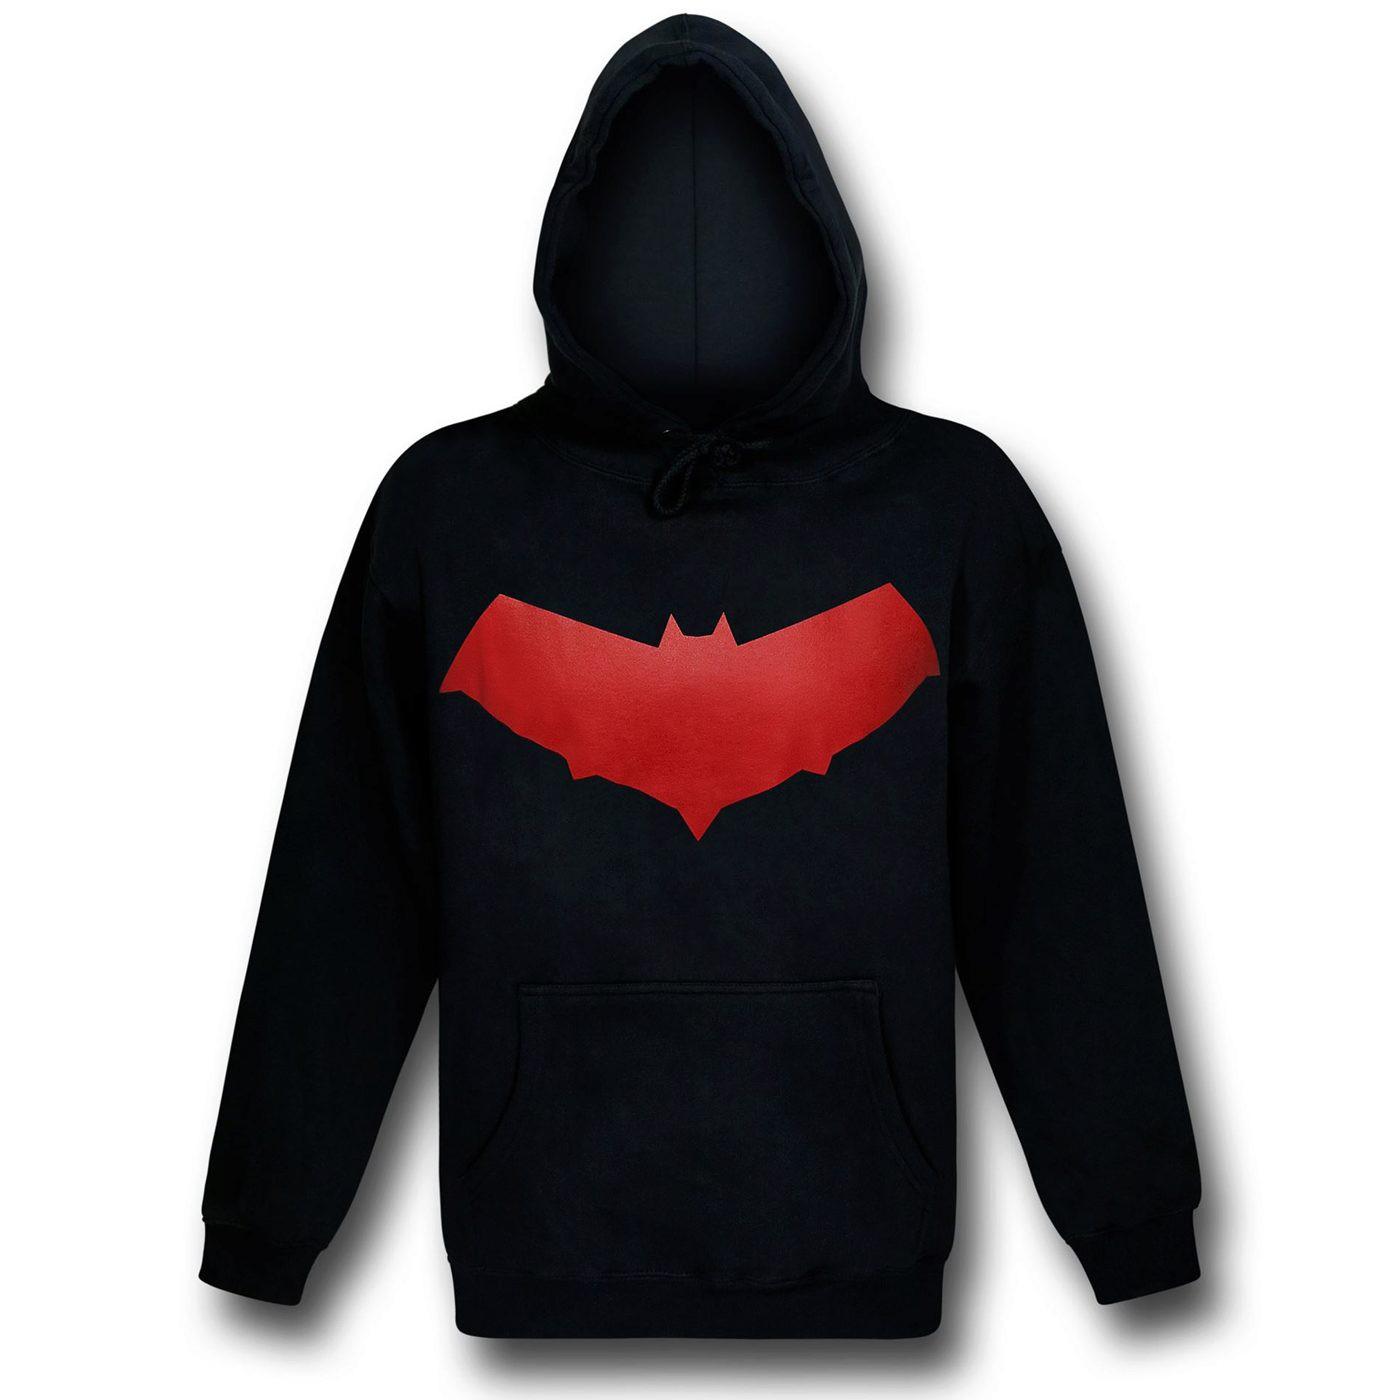 Red Hood Symbol Jason Todd Pullover Hoodie